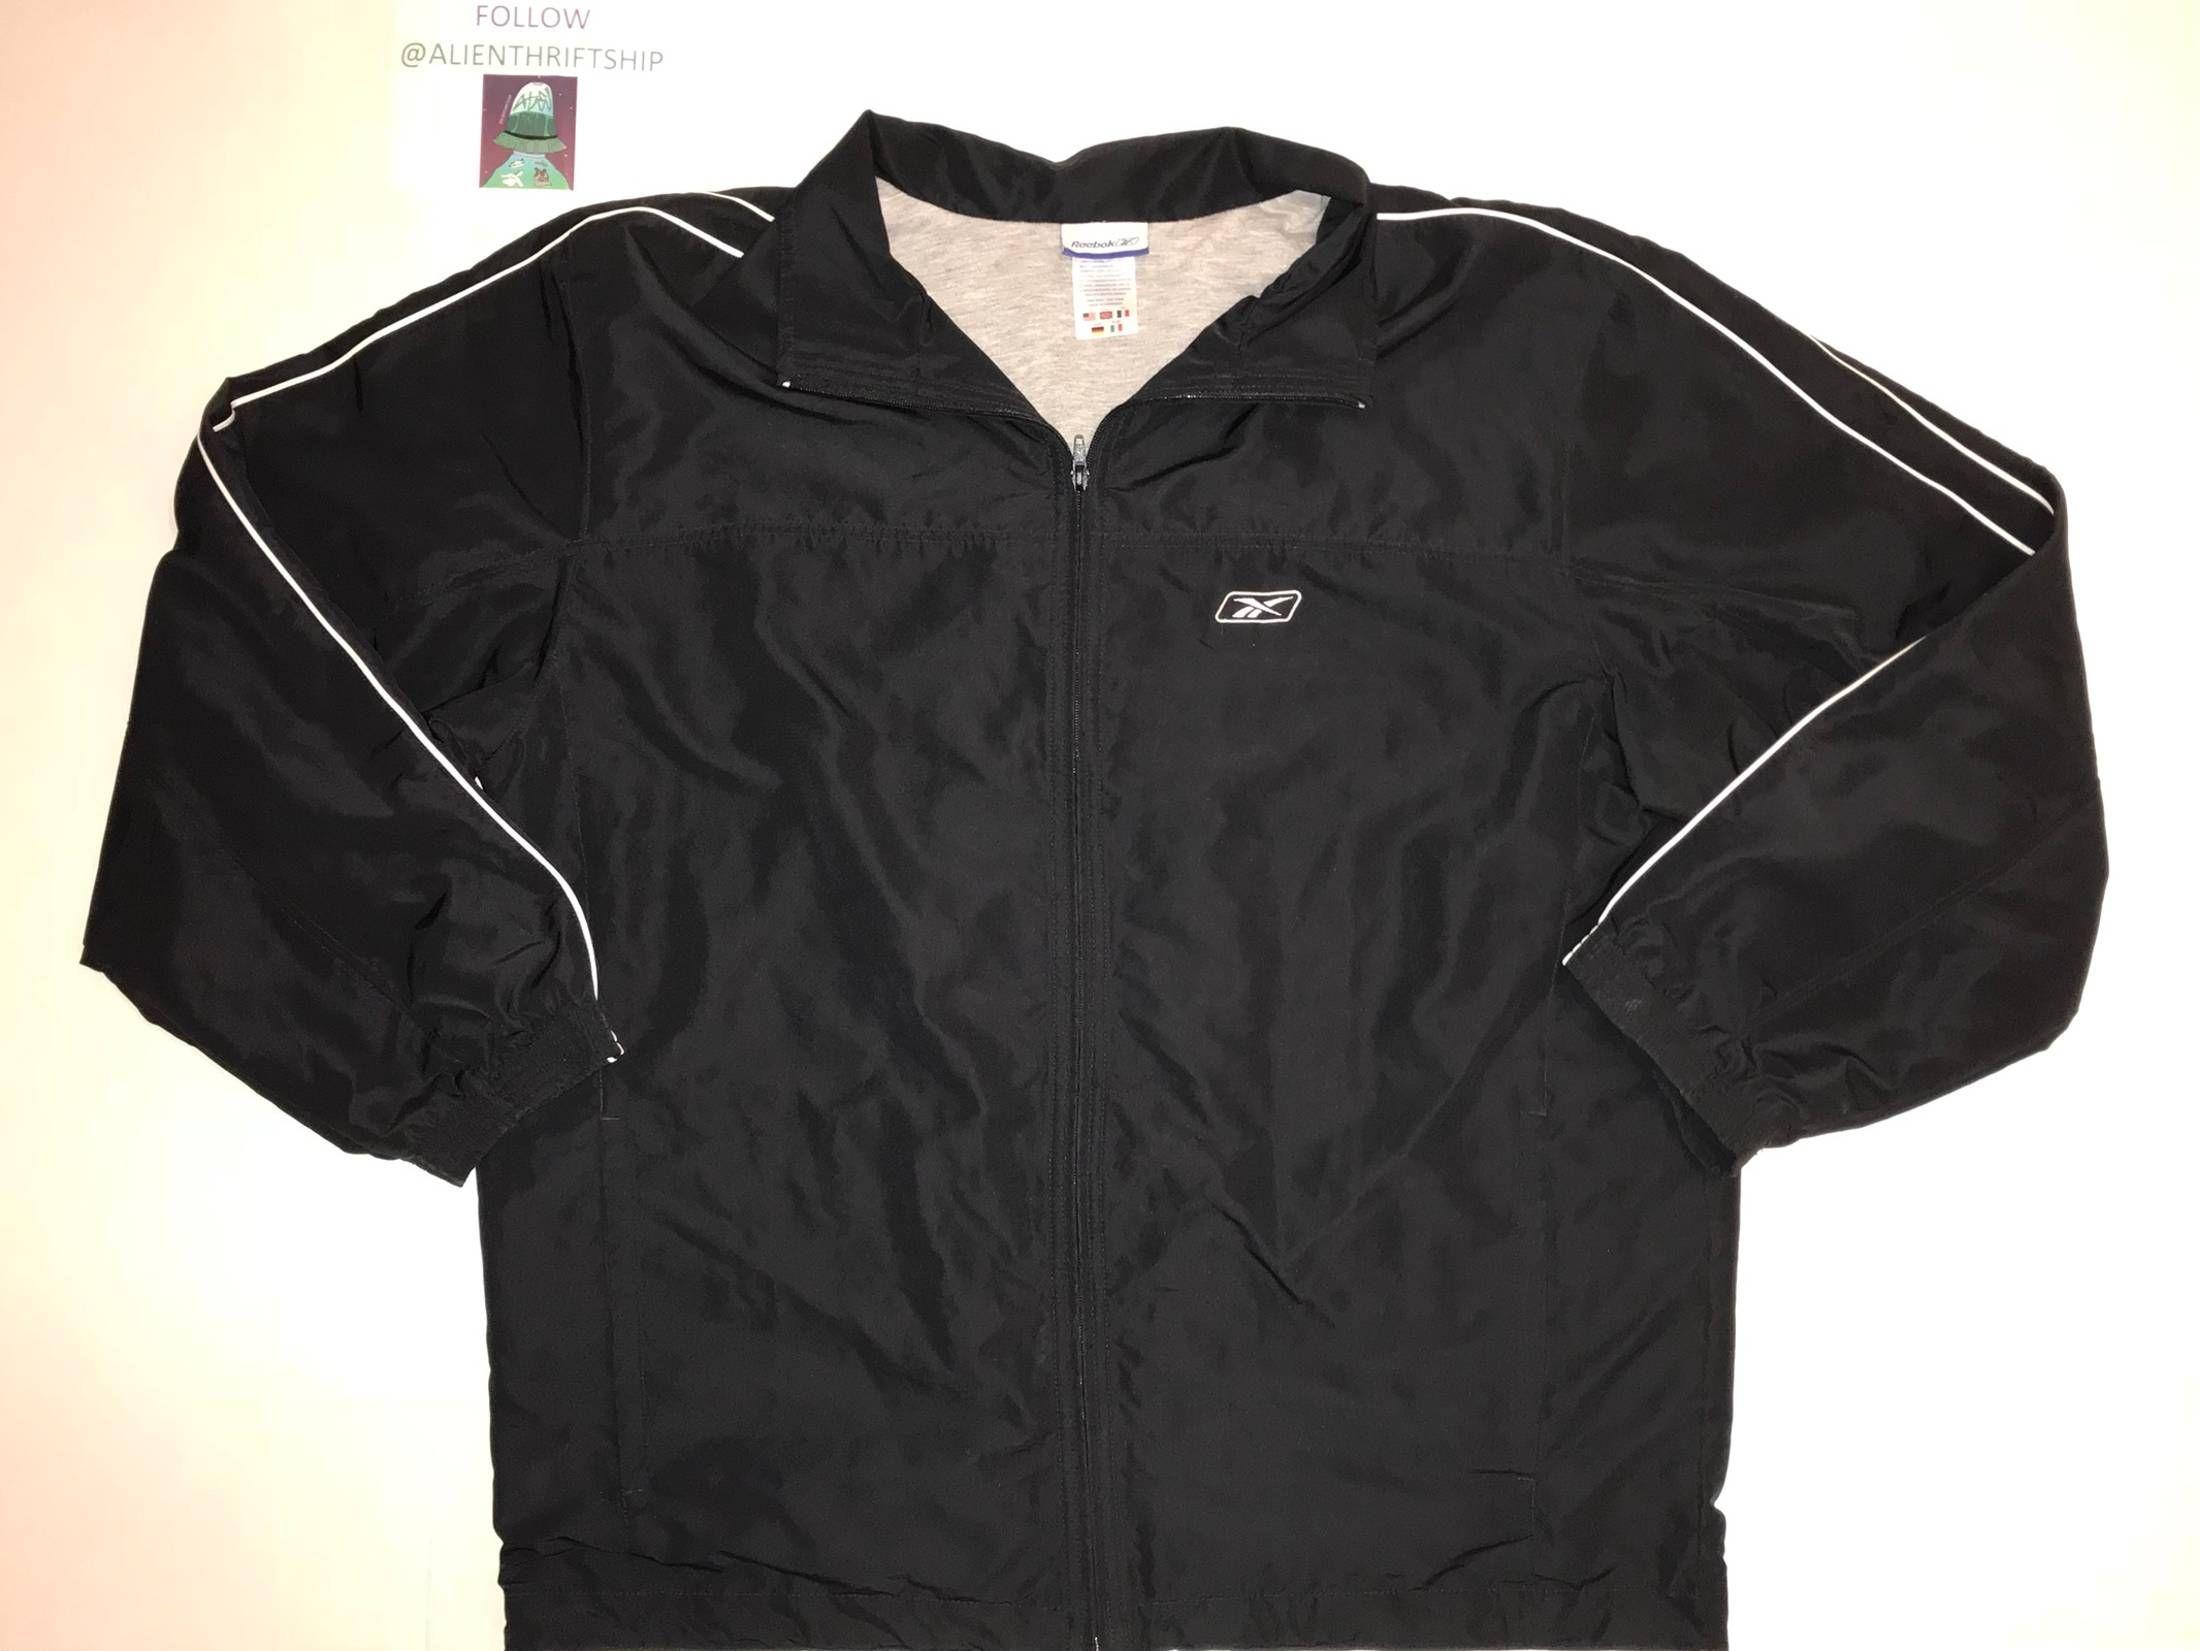 Reebok Sportswear Vintage 90s Vintage Reebok Zip Up Jacket Light Coat Size L 19 Jackets Light Coat Vintage Reebok [ 1651 x 2200 Pixel ]